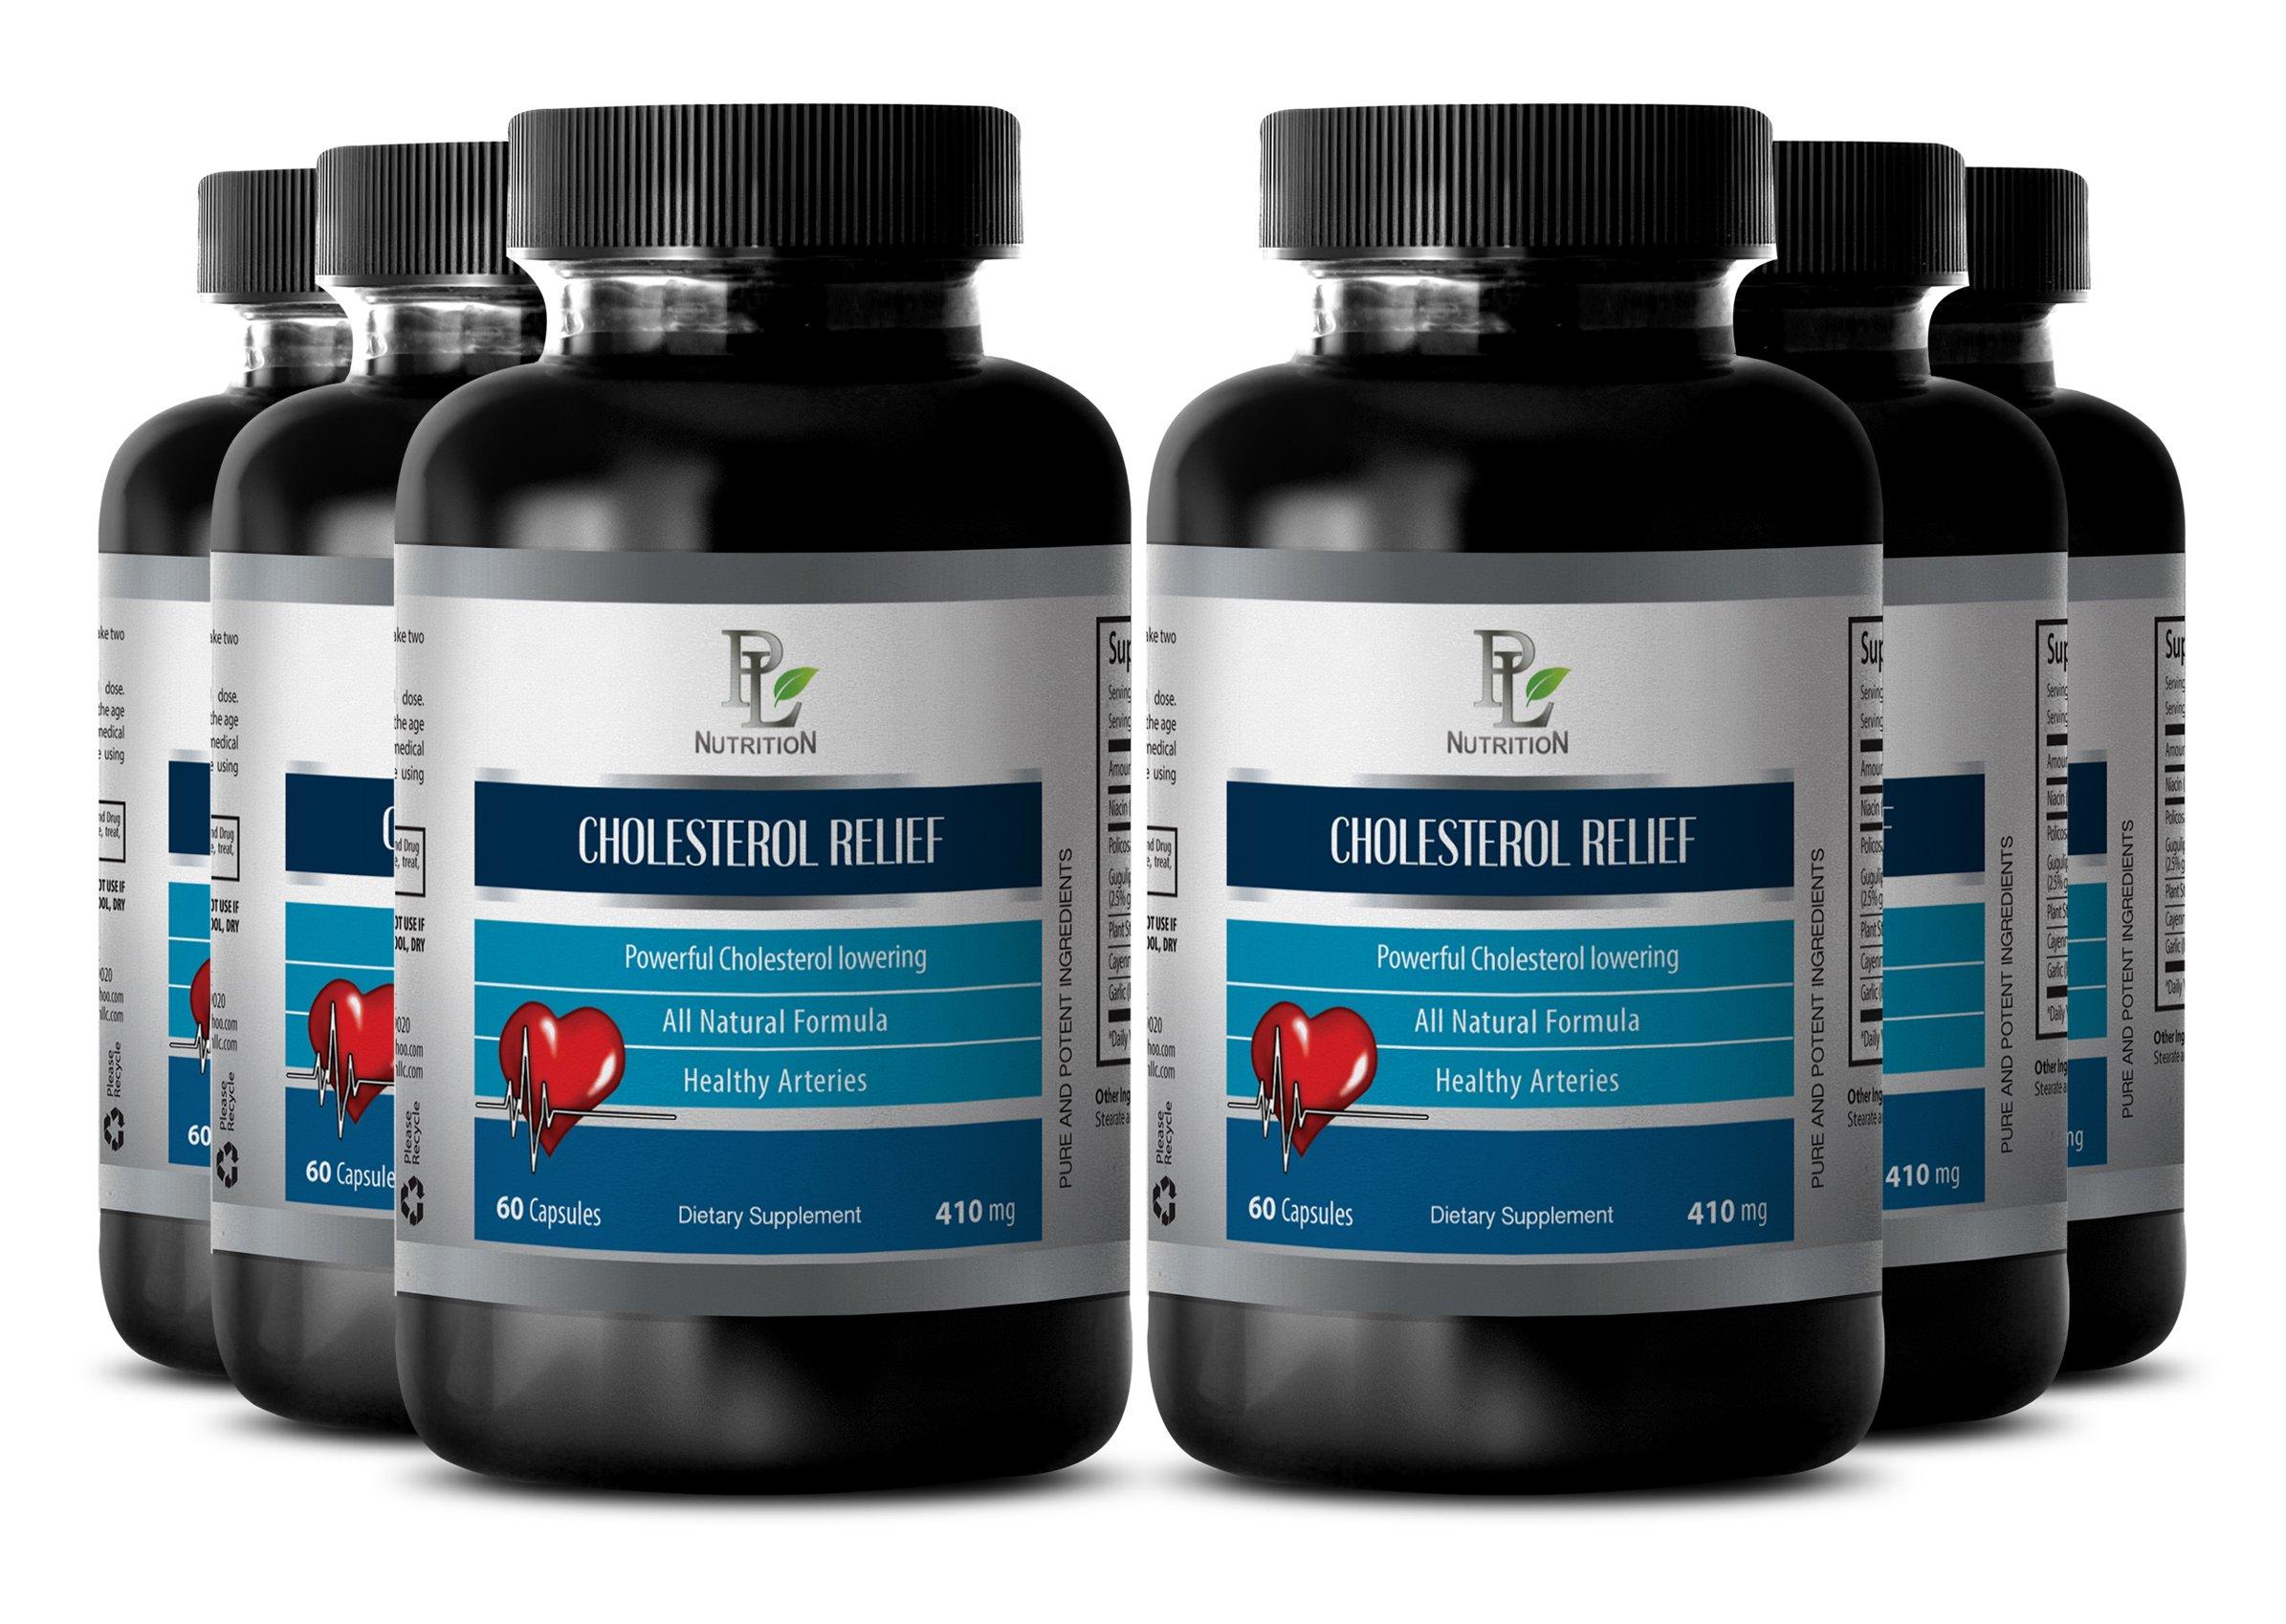 Liver regenerator - CHOLESTEROL RELIEF - Digestive aid - 6 Bottles 360 Capsules